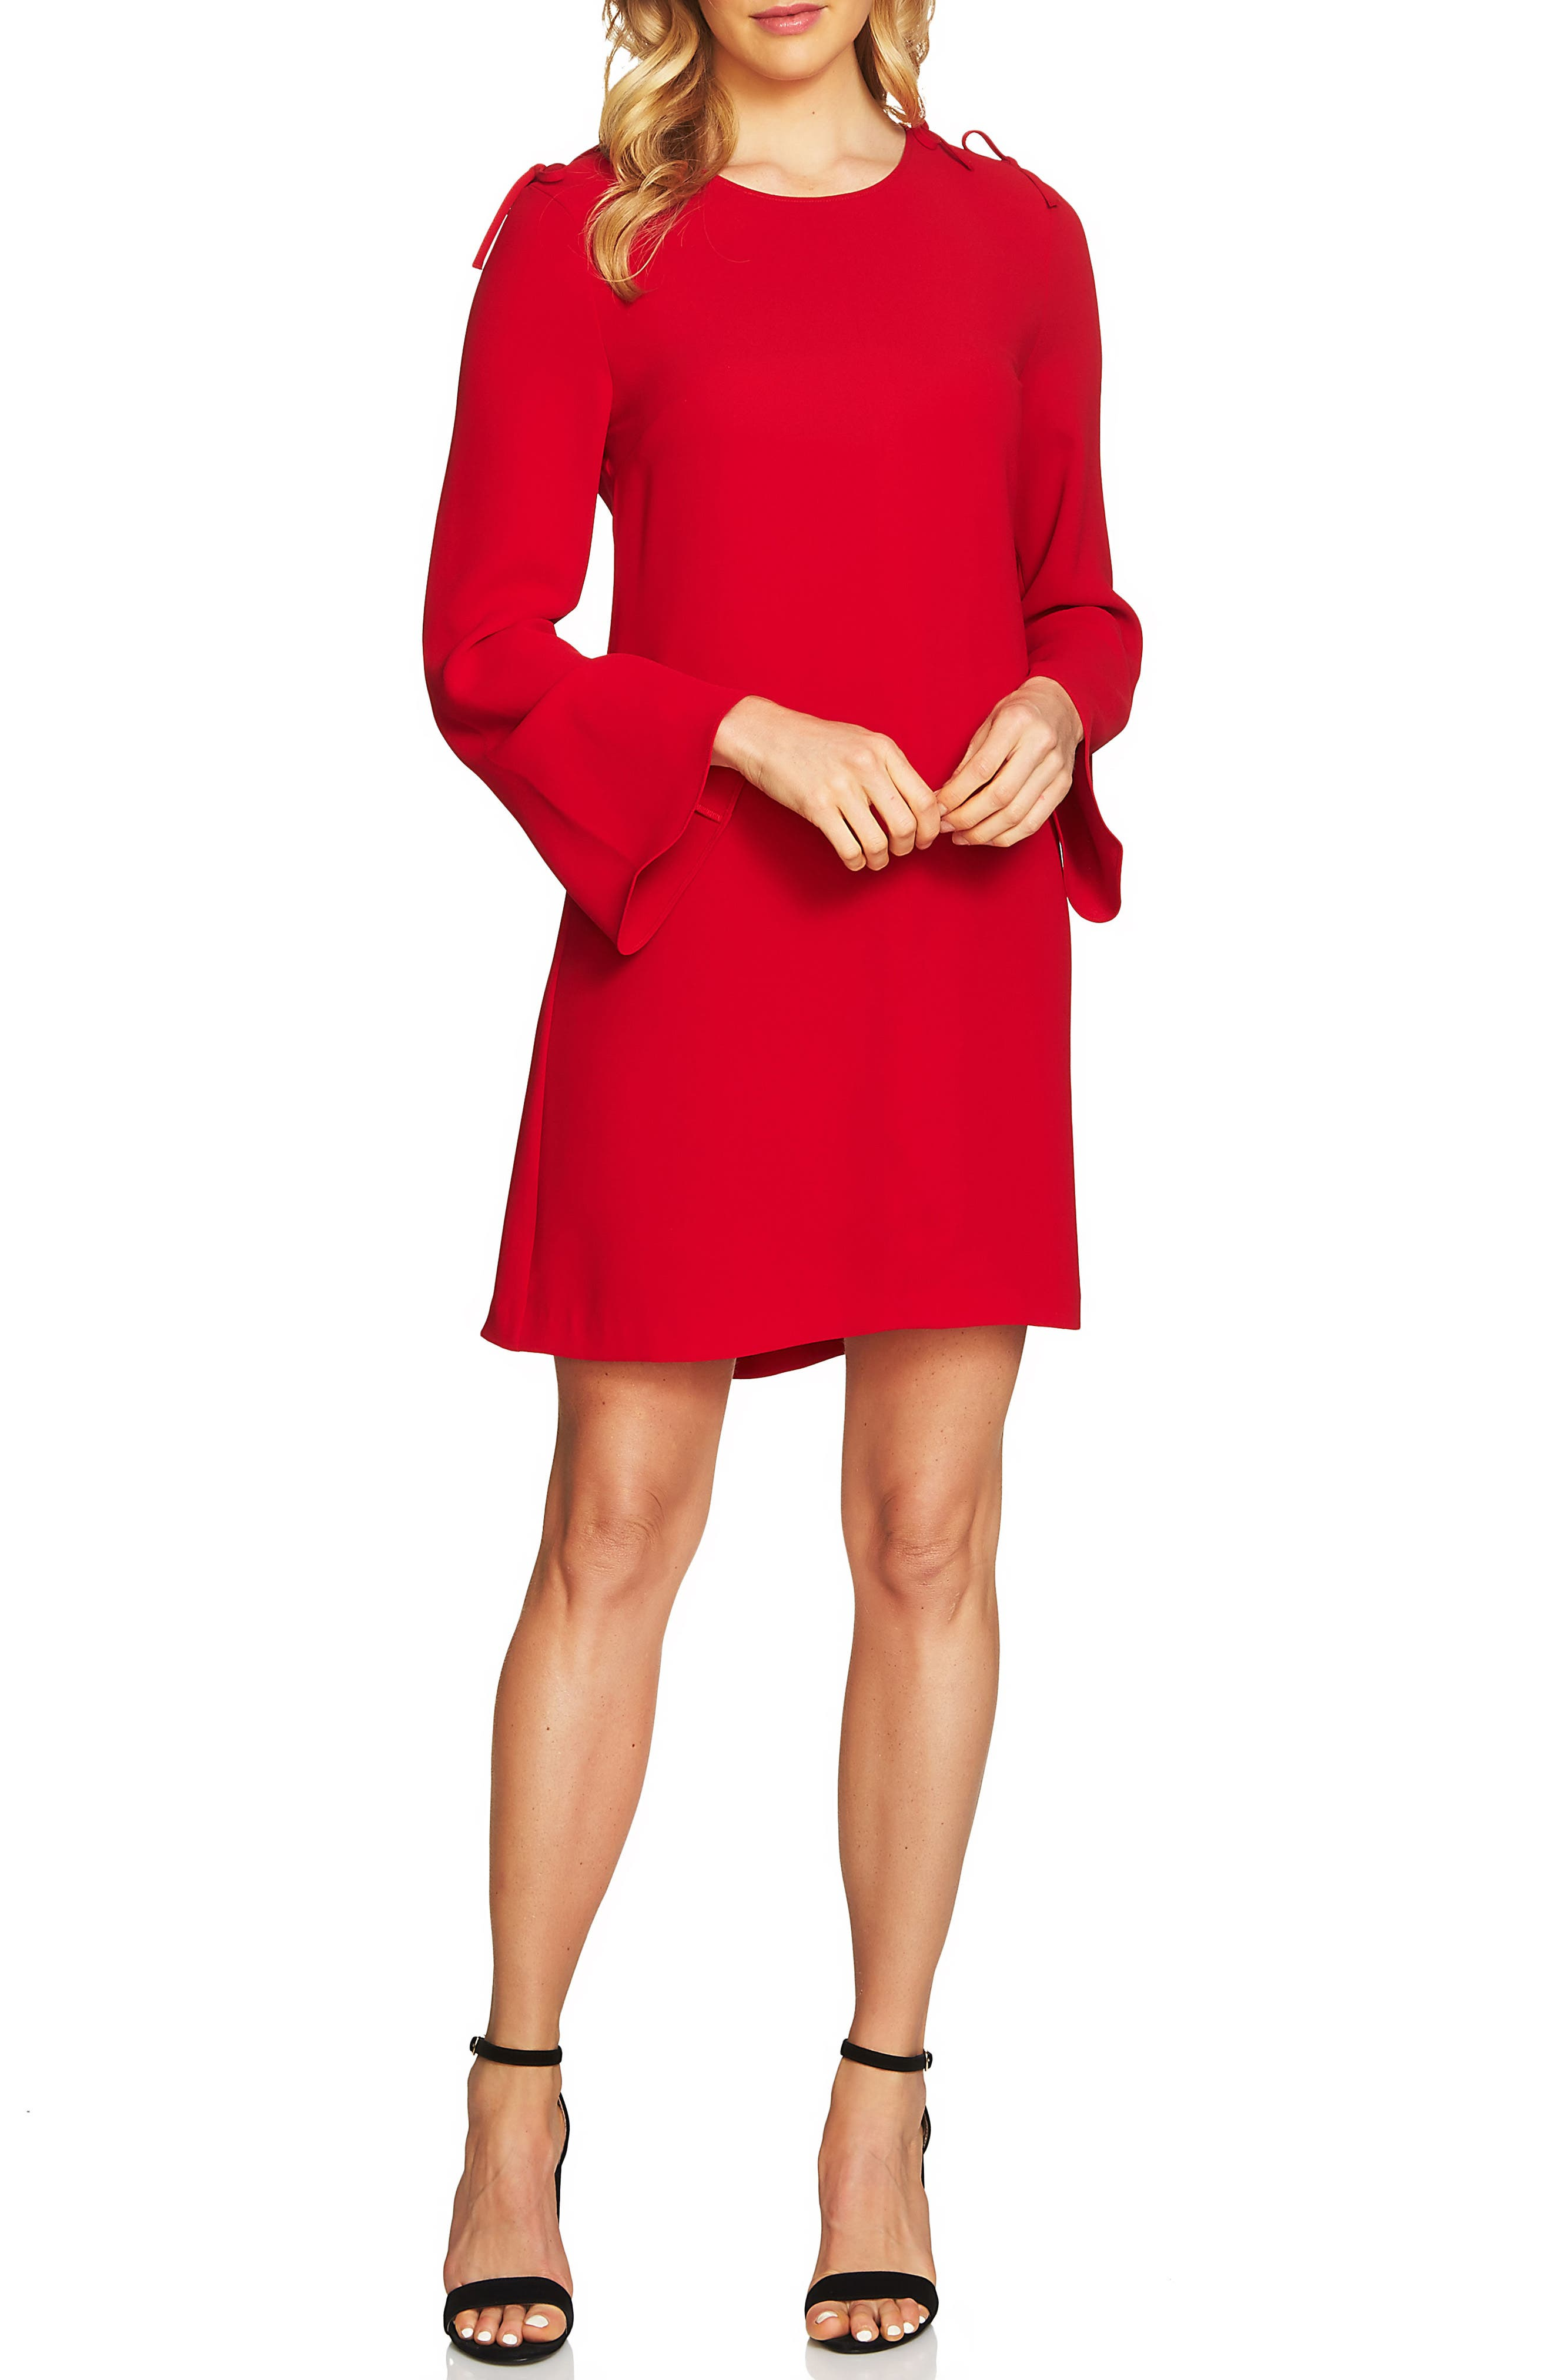 Alternate Image 1 Selected - CeCe Moss Tie Shoulder Bell Sleeve Shift Dress